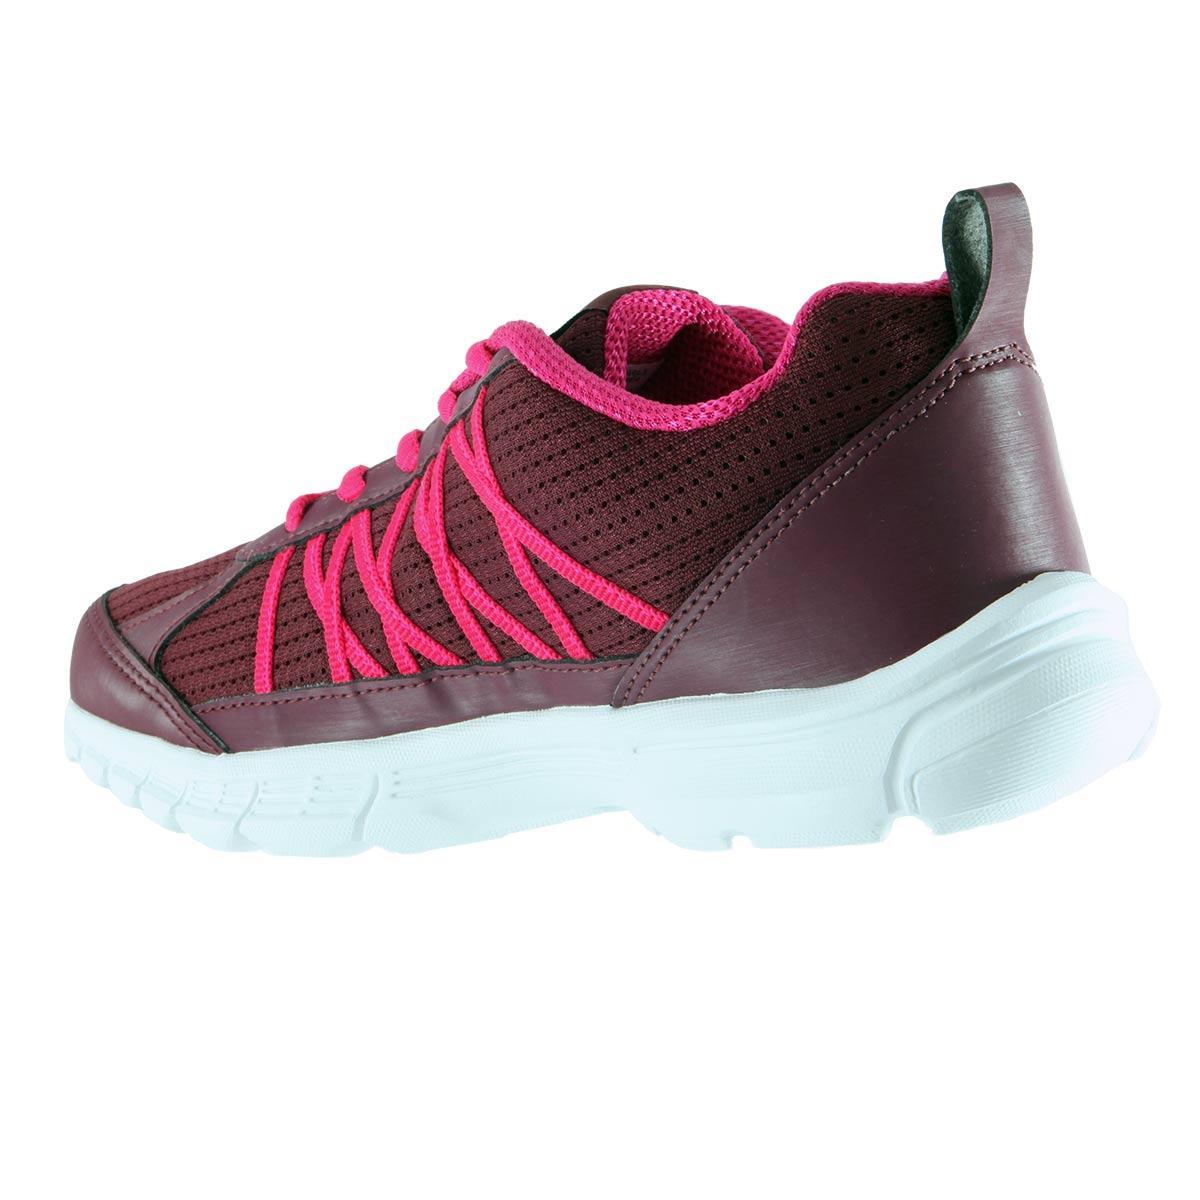 bee2acef9c8 ... Tênis Reebok Speedlux 2.0 Feminino Corrida Caminhada BD5449 ...